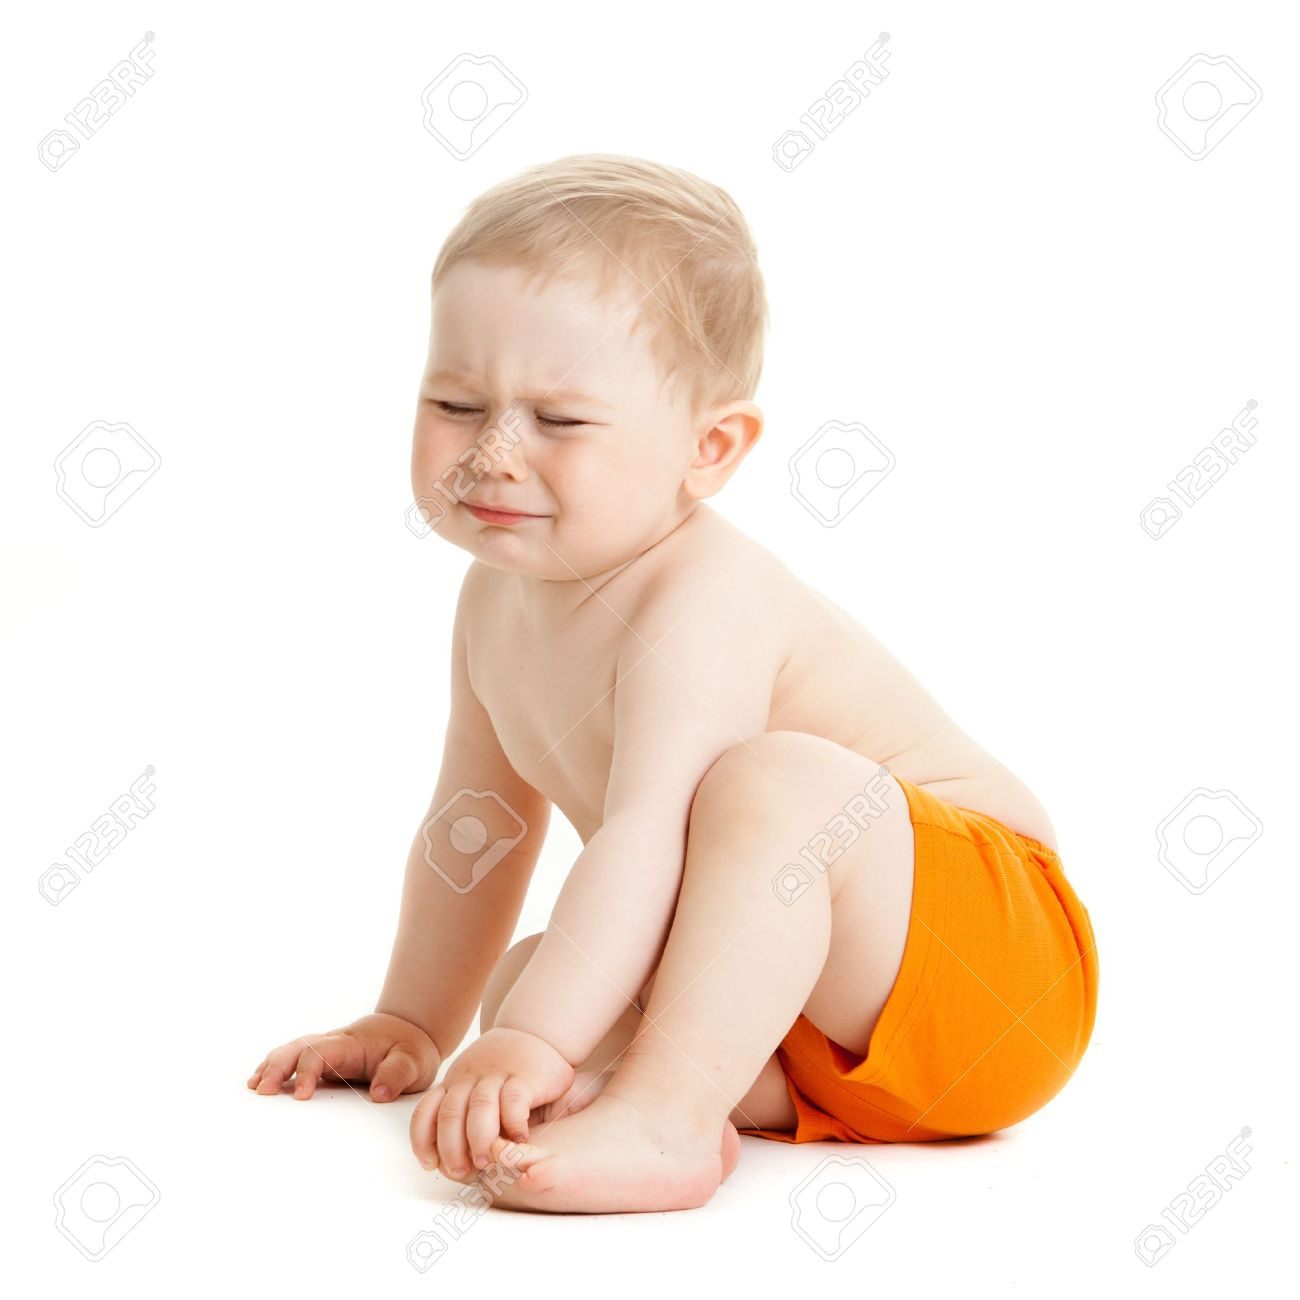 crying baby boy isolated. Stock Photo - 20019627